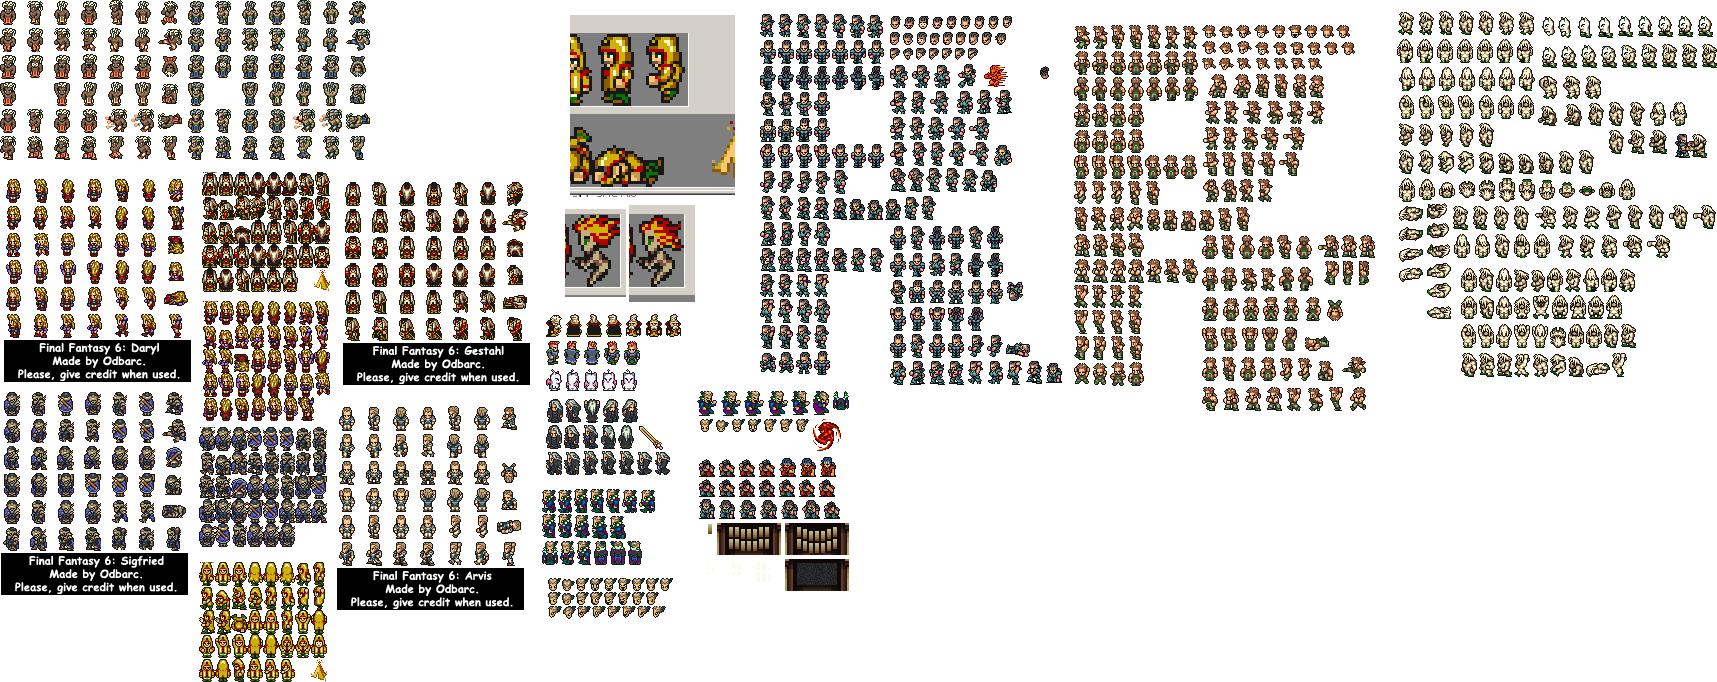 Final Fantasy 6 Custom sprites